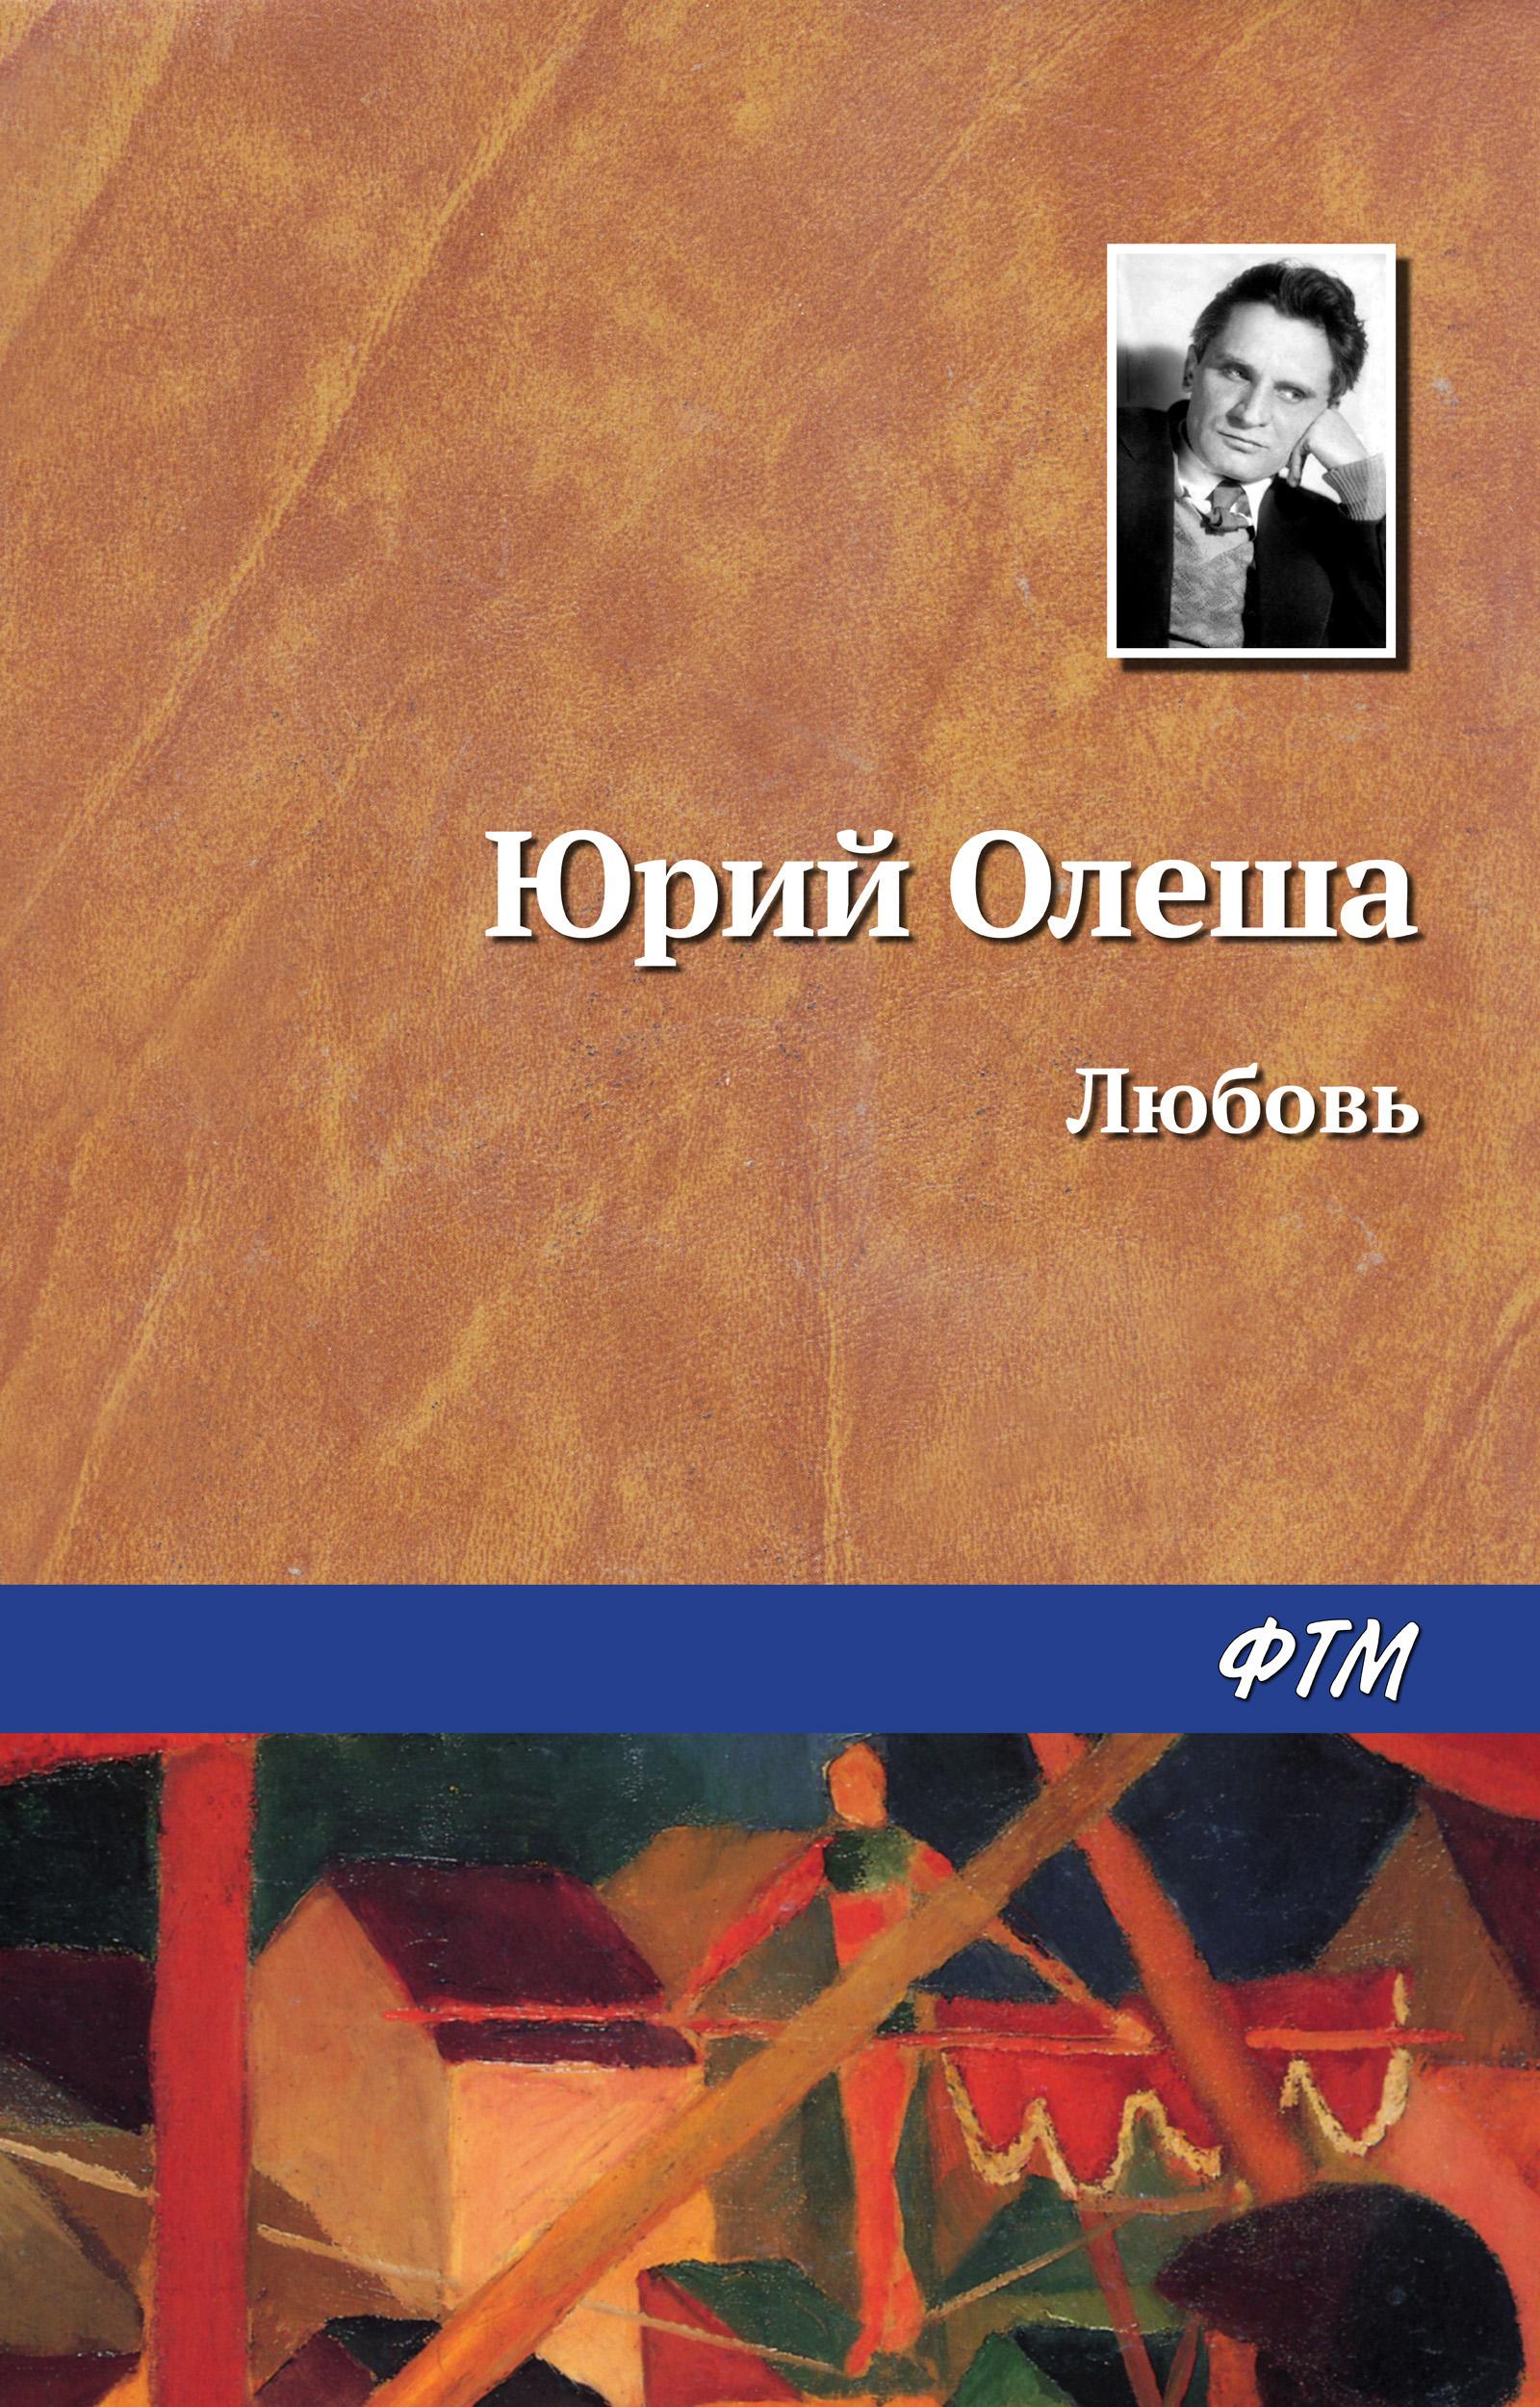 цена на Юрий Олеша Любовь